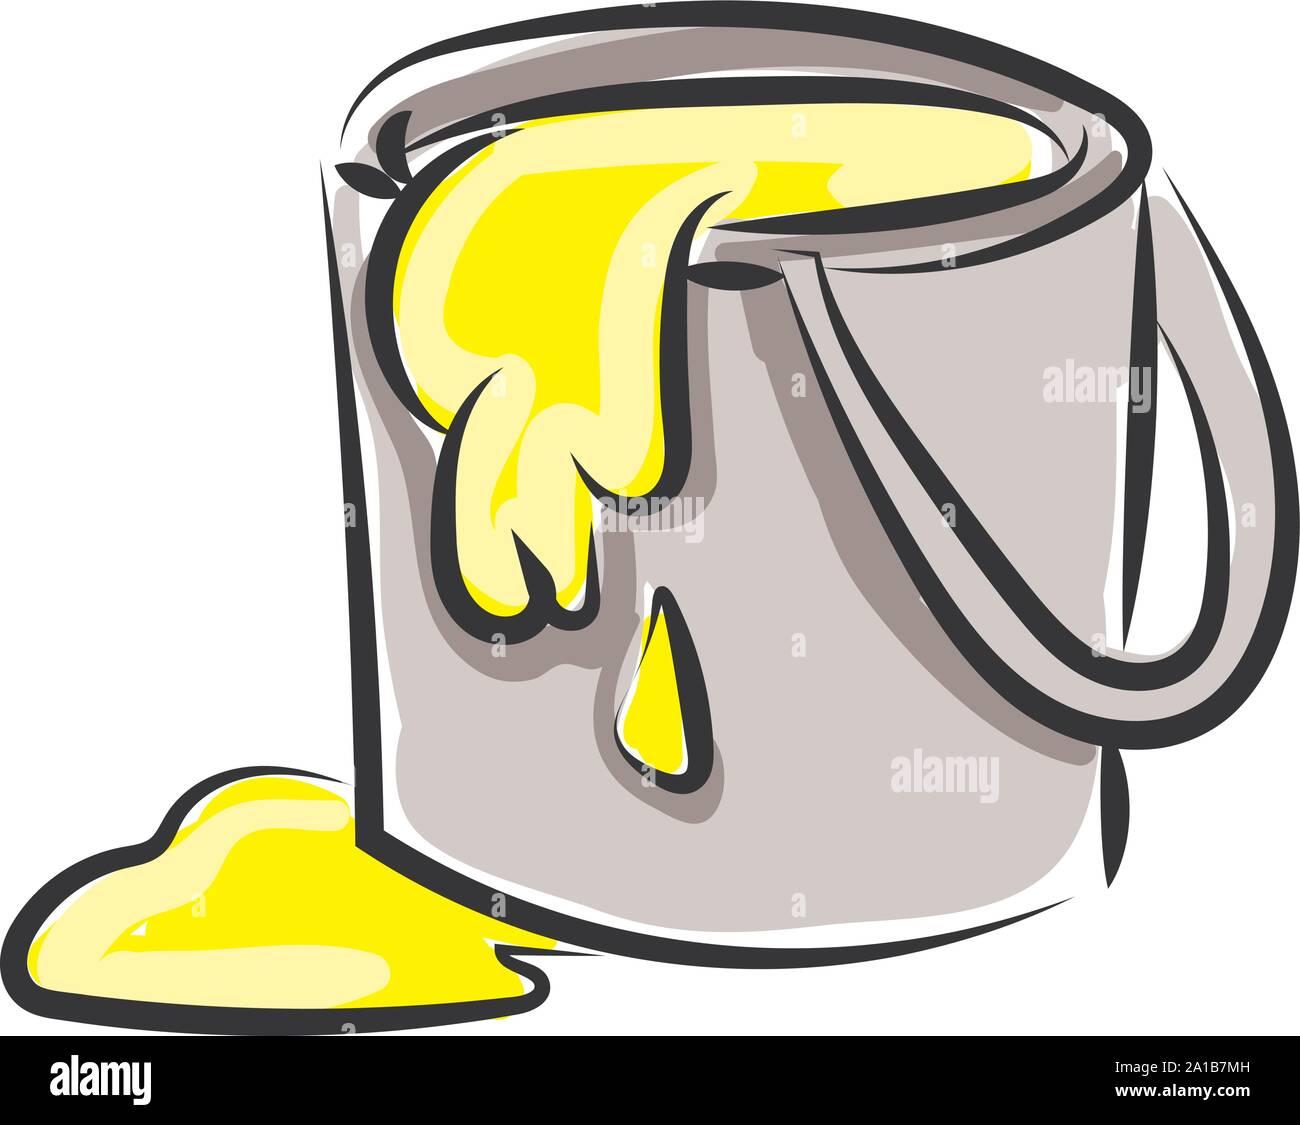 Paint Bucket Illustration Vector On White Background Stock Vector Image Art Alamy